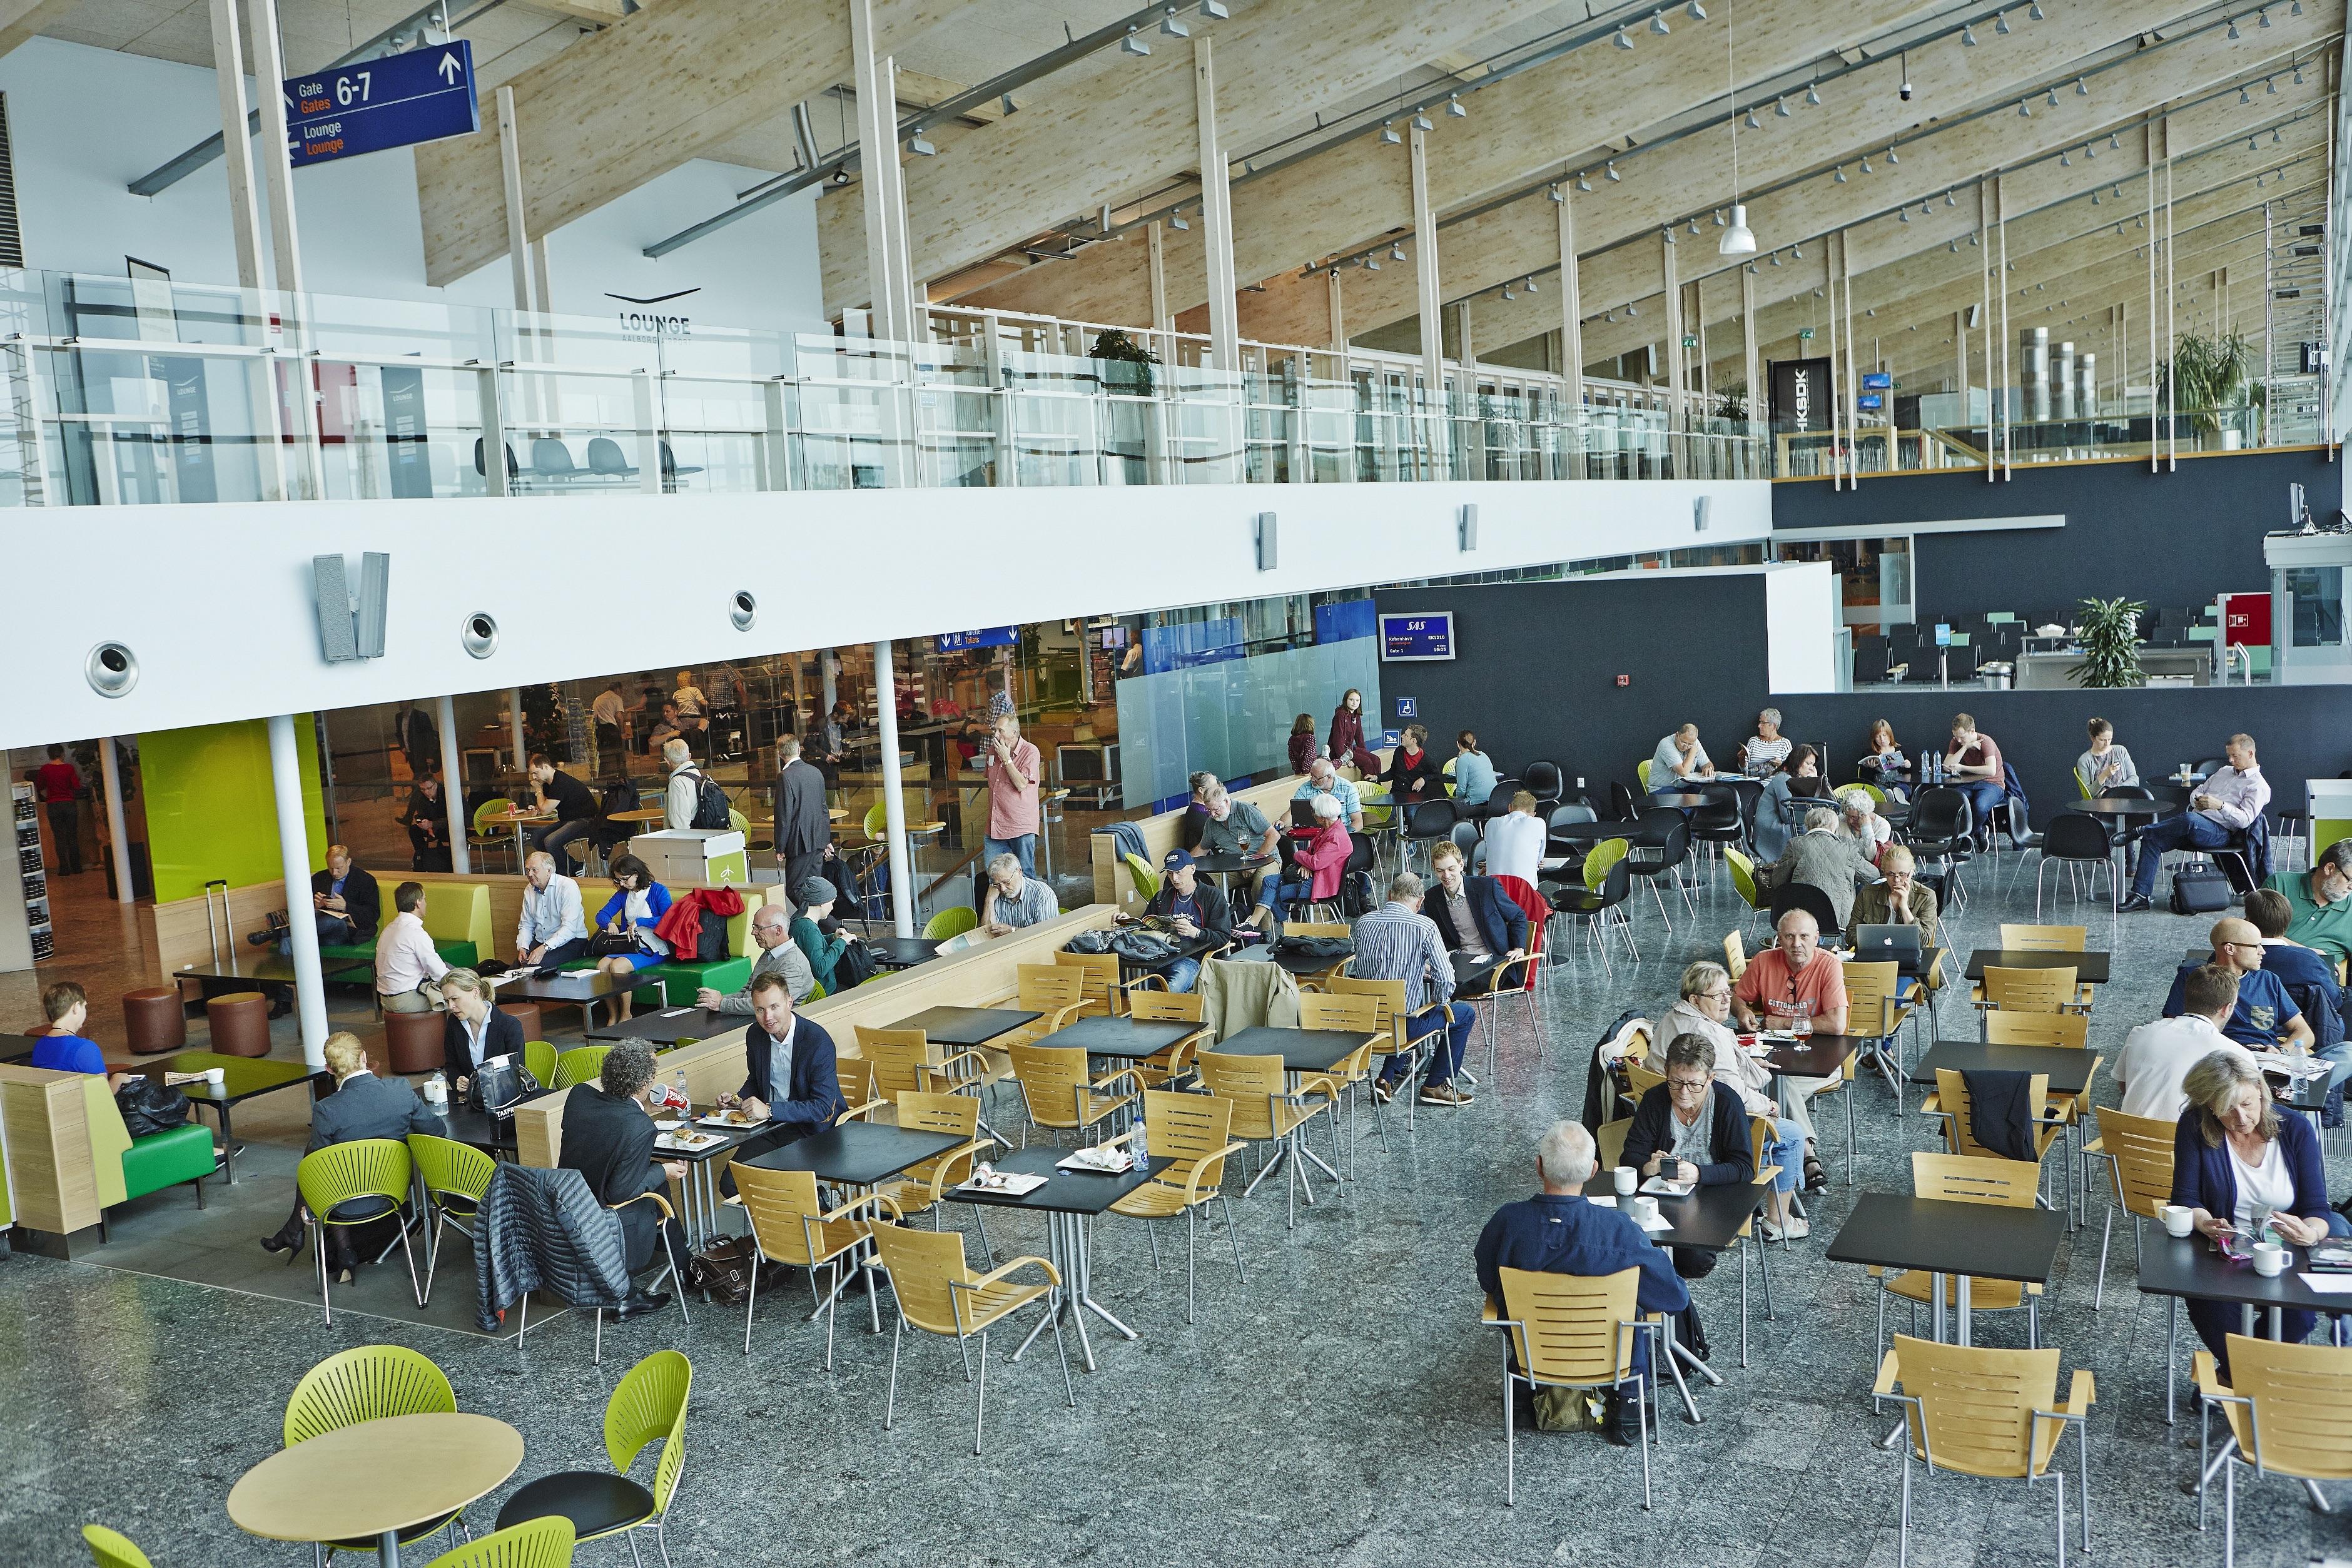 aalborg lufthavn bagage